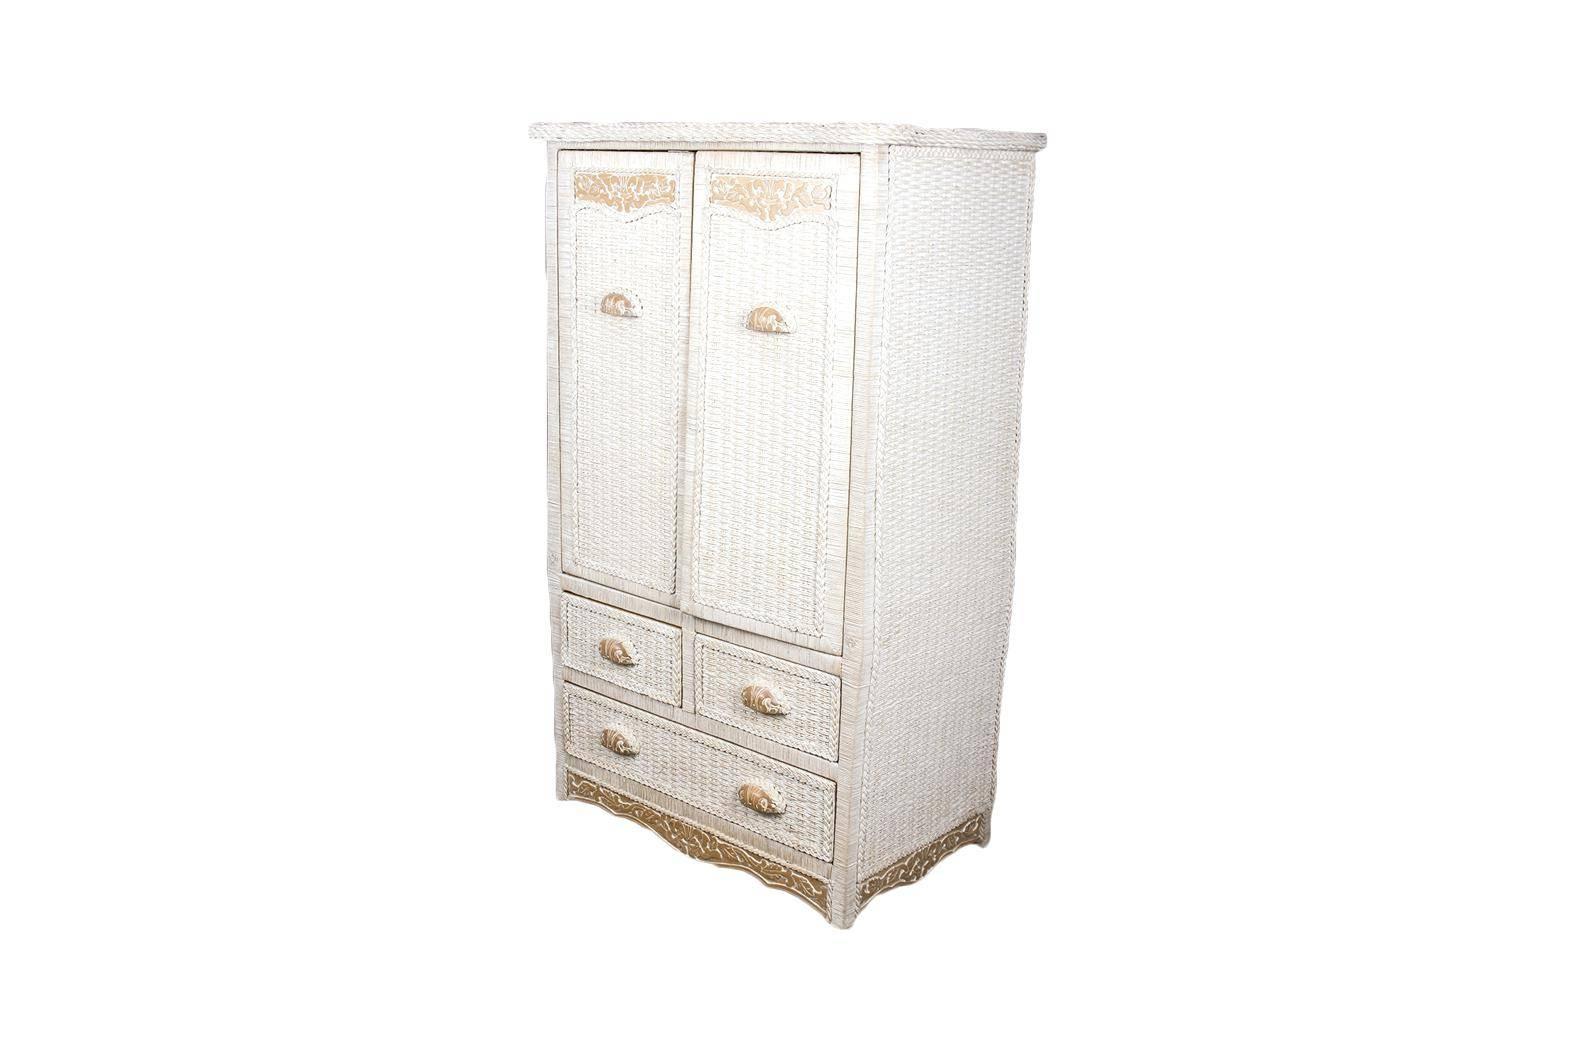 White Standing Mirror Jewelry Armoire Wicker Wardrobe Ebay Corner within Wicker Armoire Wardrobes (Image 14 of 15)